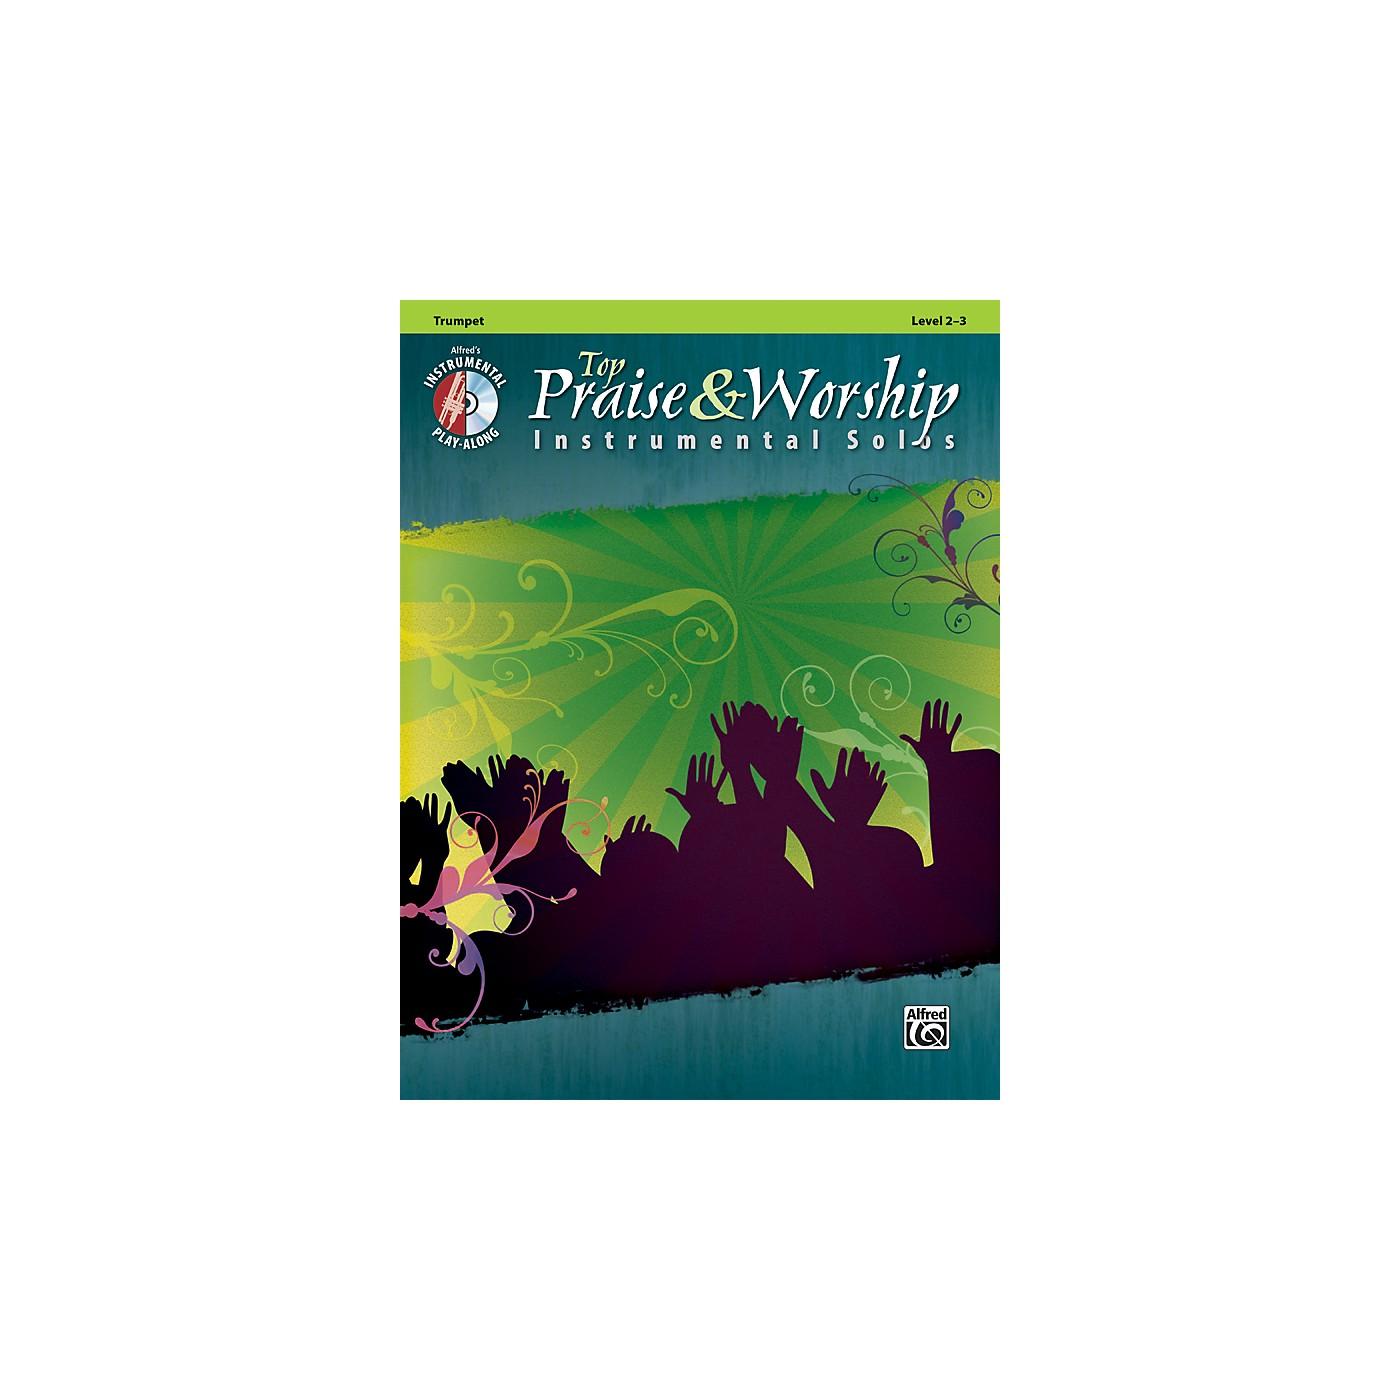 Alfred Top Praise & Worship Instrumental Solos - Trumpet, Level 2-3 (Book/CD) thumbnail